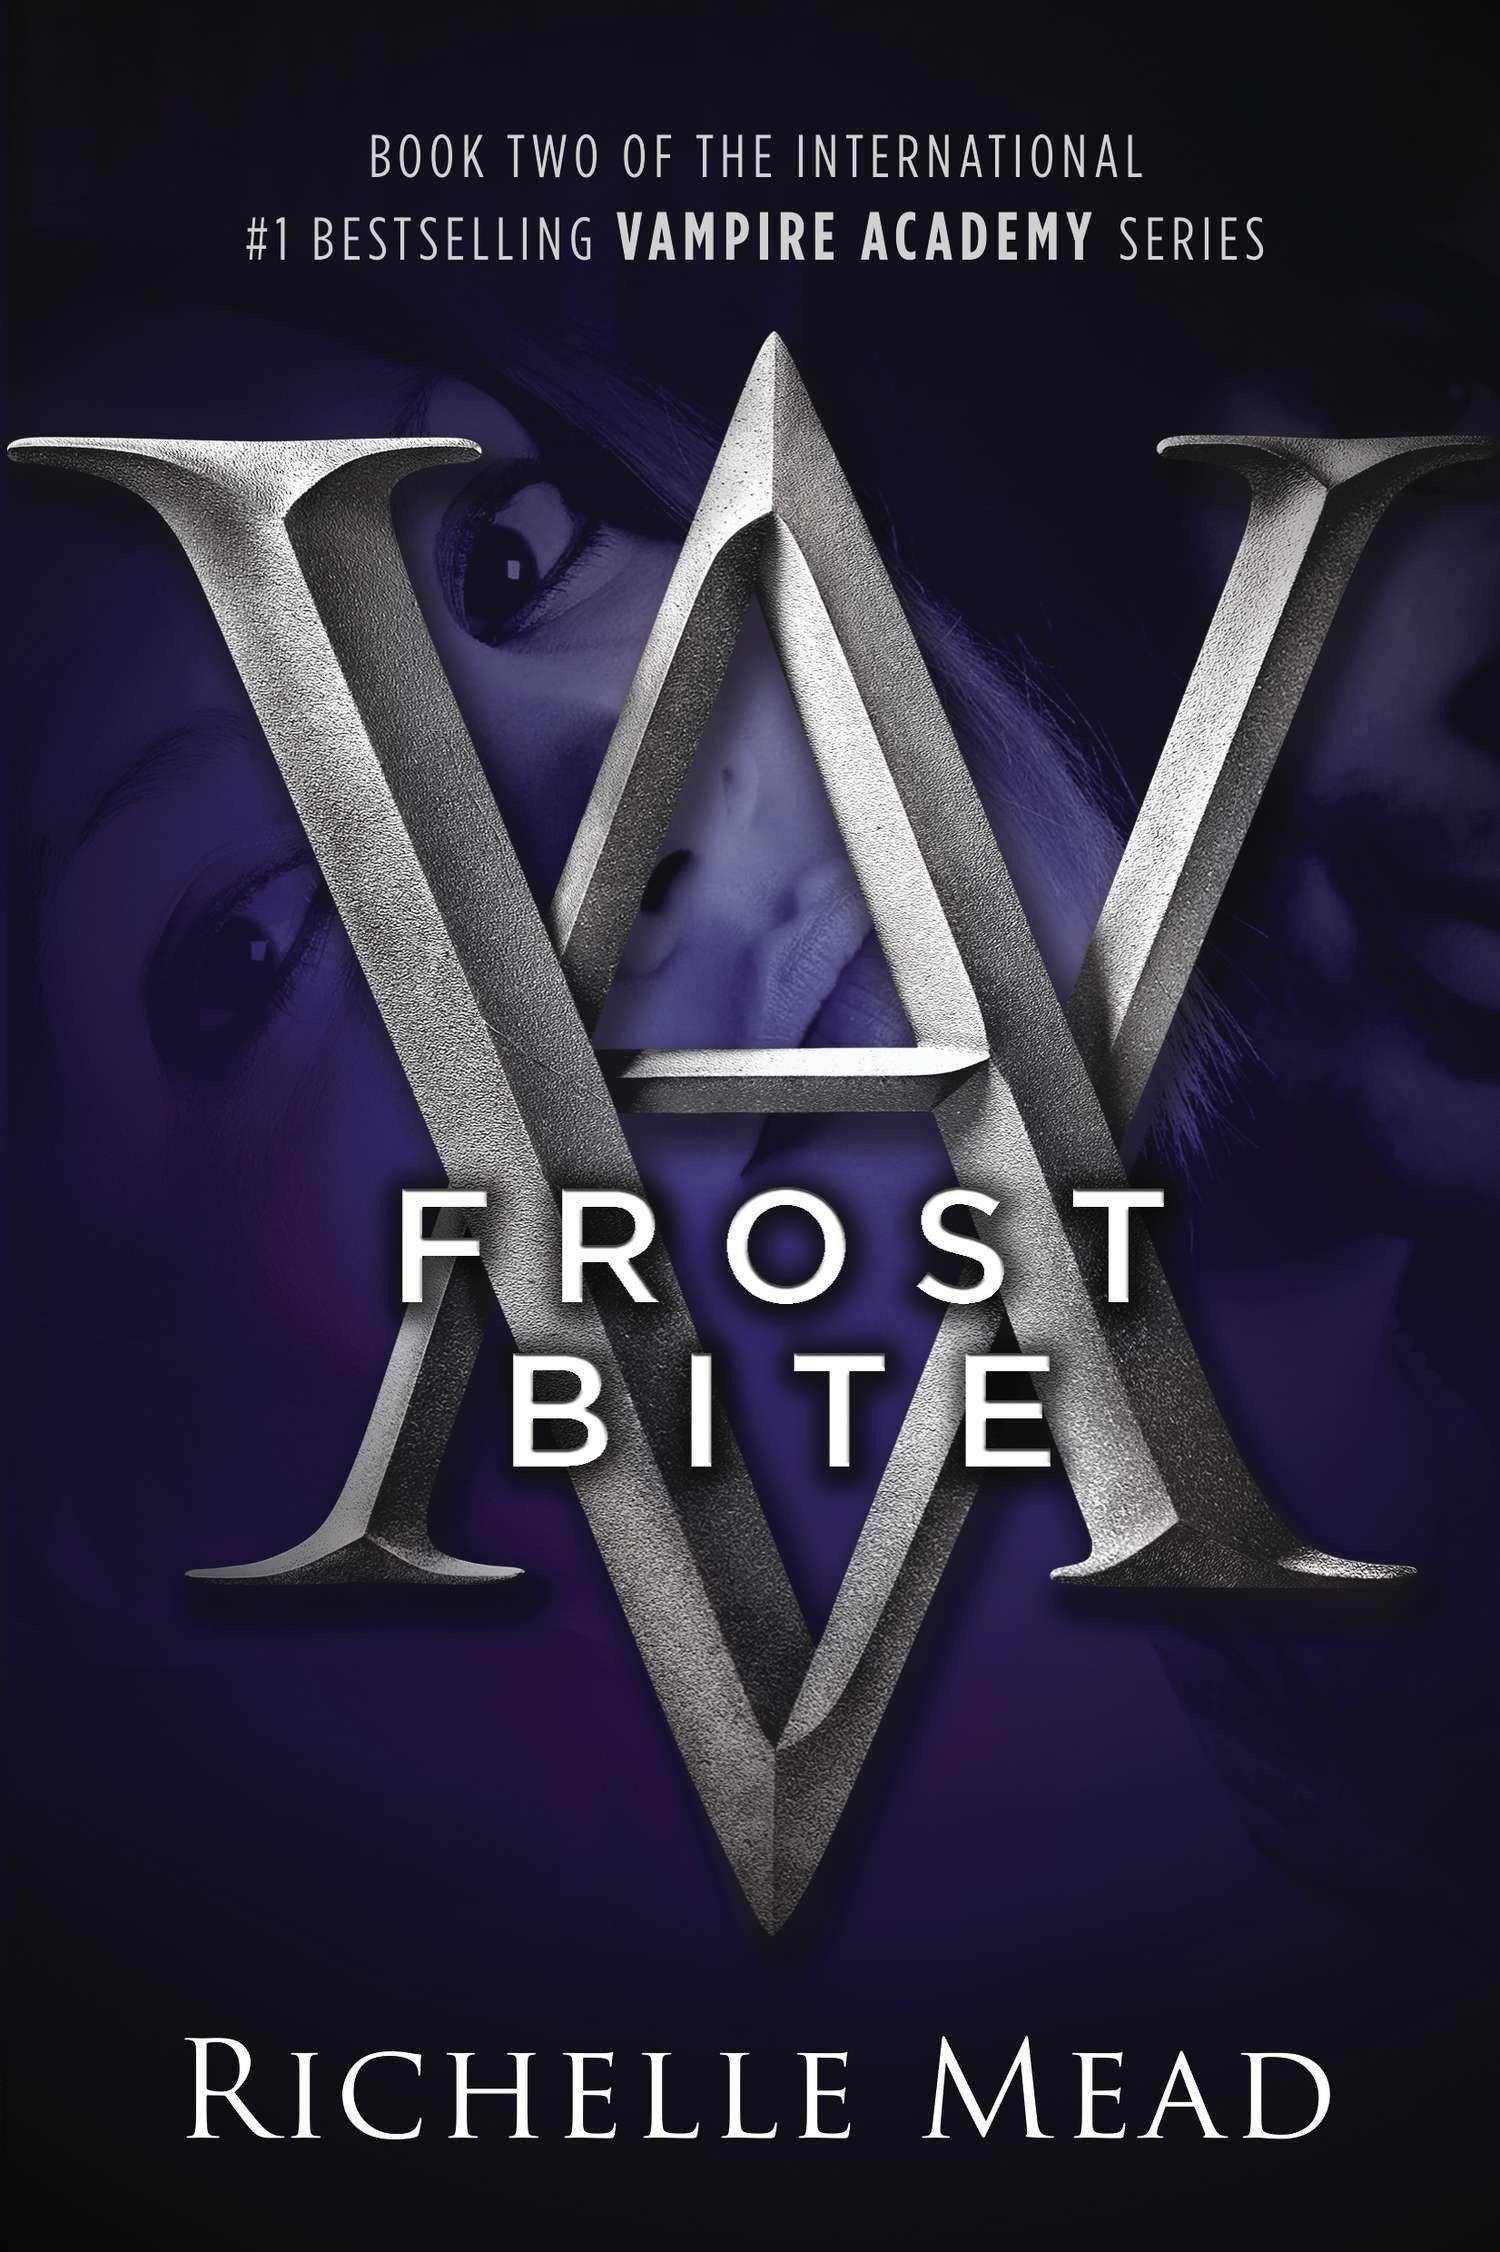 Image result for frostbite book